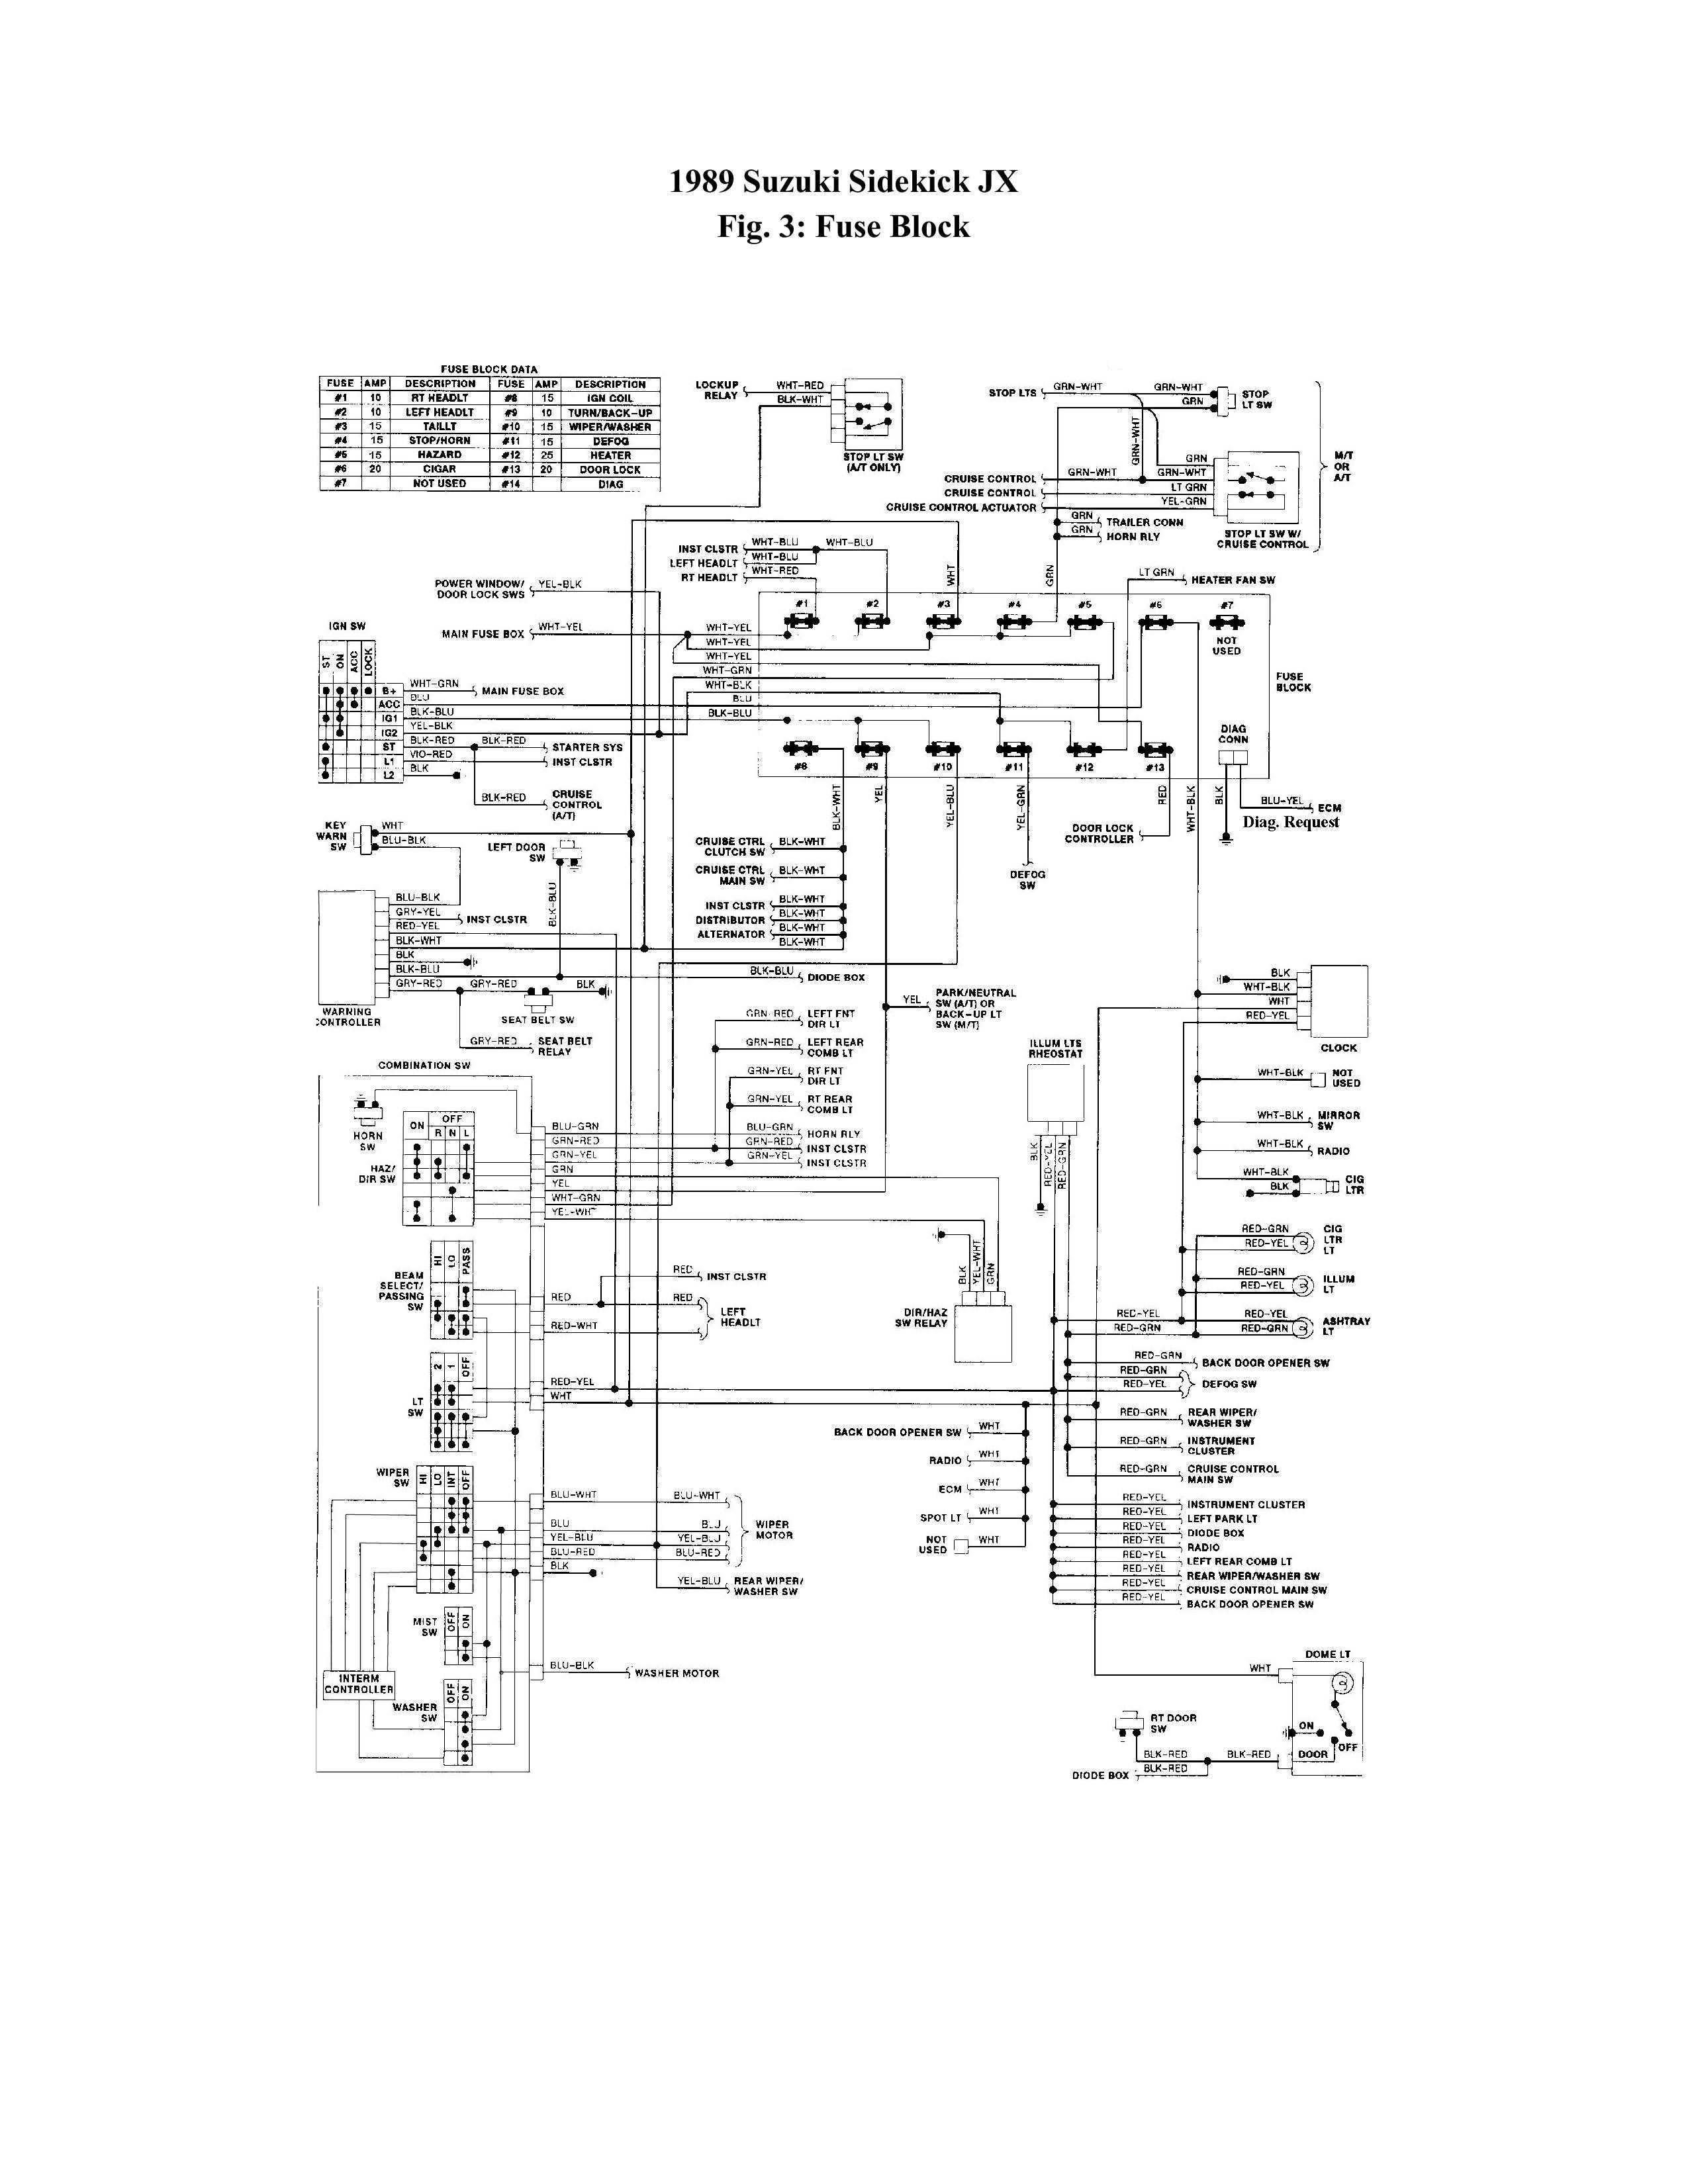 [SCHEMATICS_4UK]  5915 1993 Suzuki Sidekick Fuse Box - Diagram Schematic   Wiring Library   1993 Suzuki Sidekick Fuse Box      Wiring Library